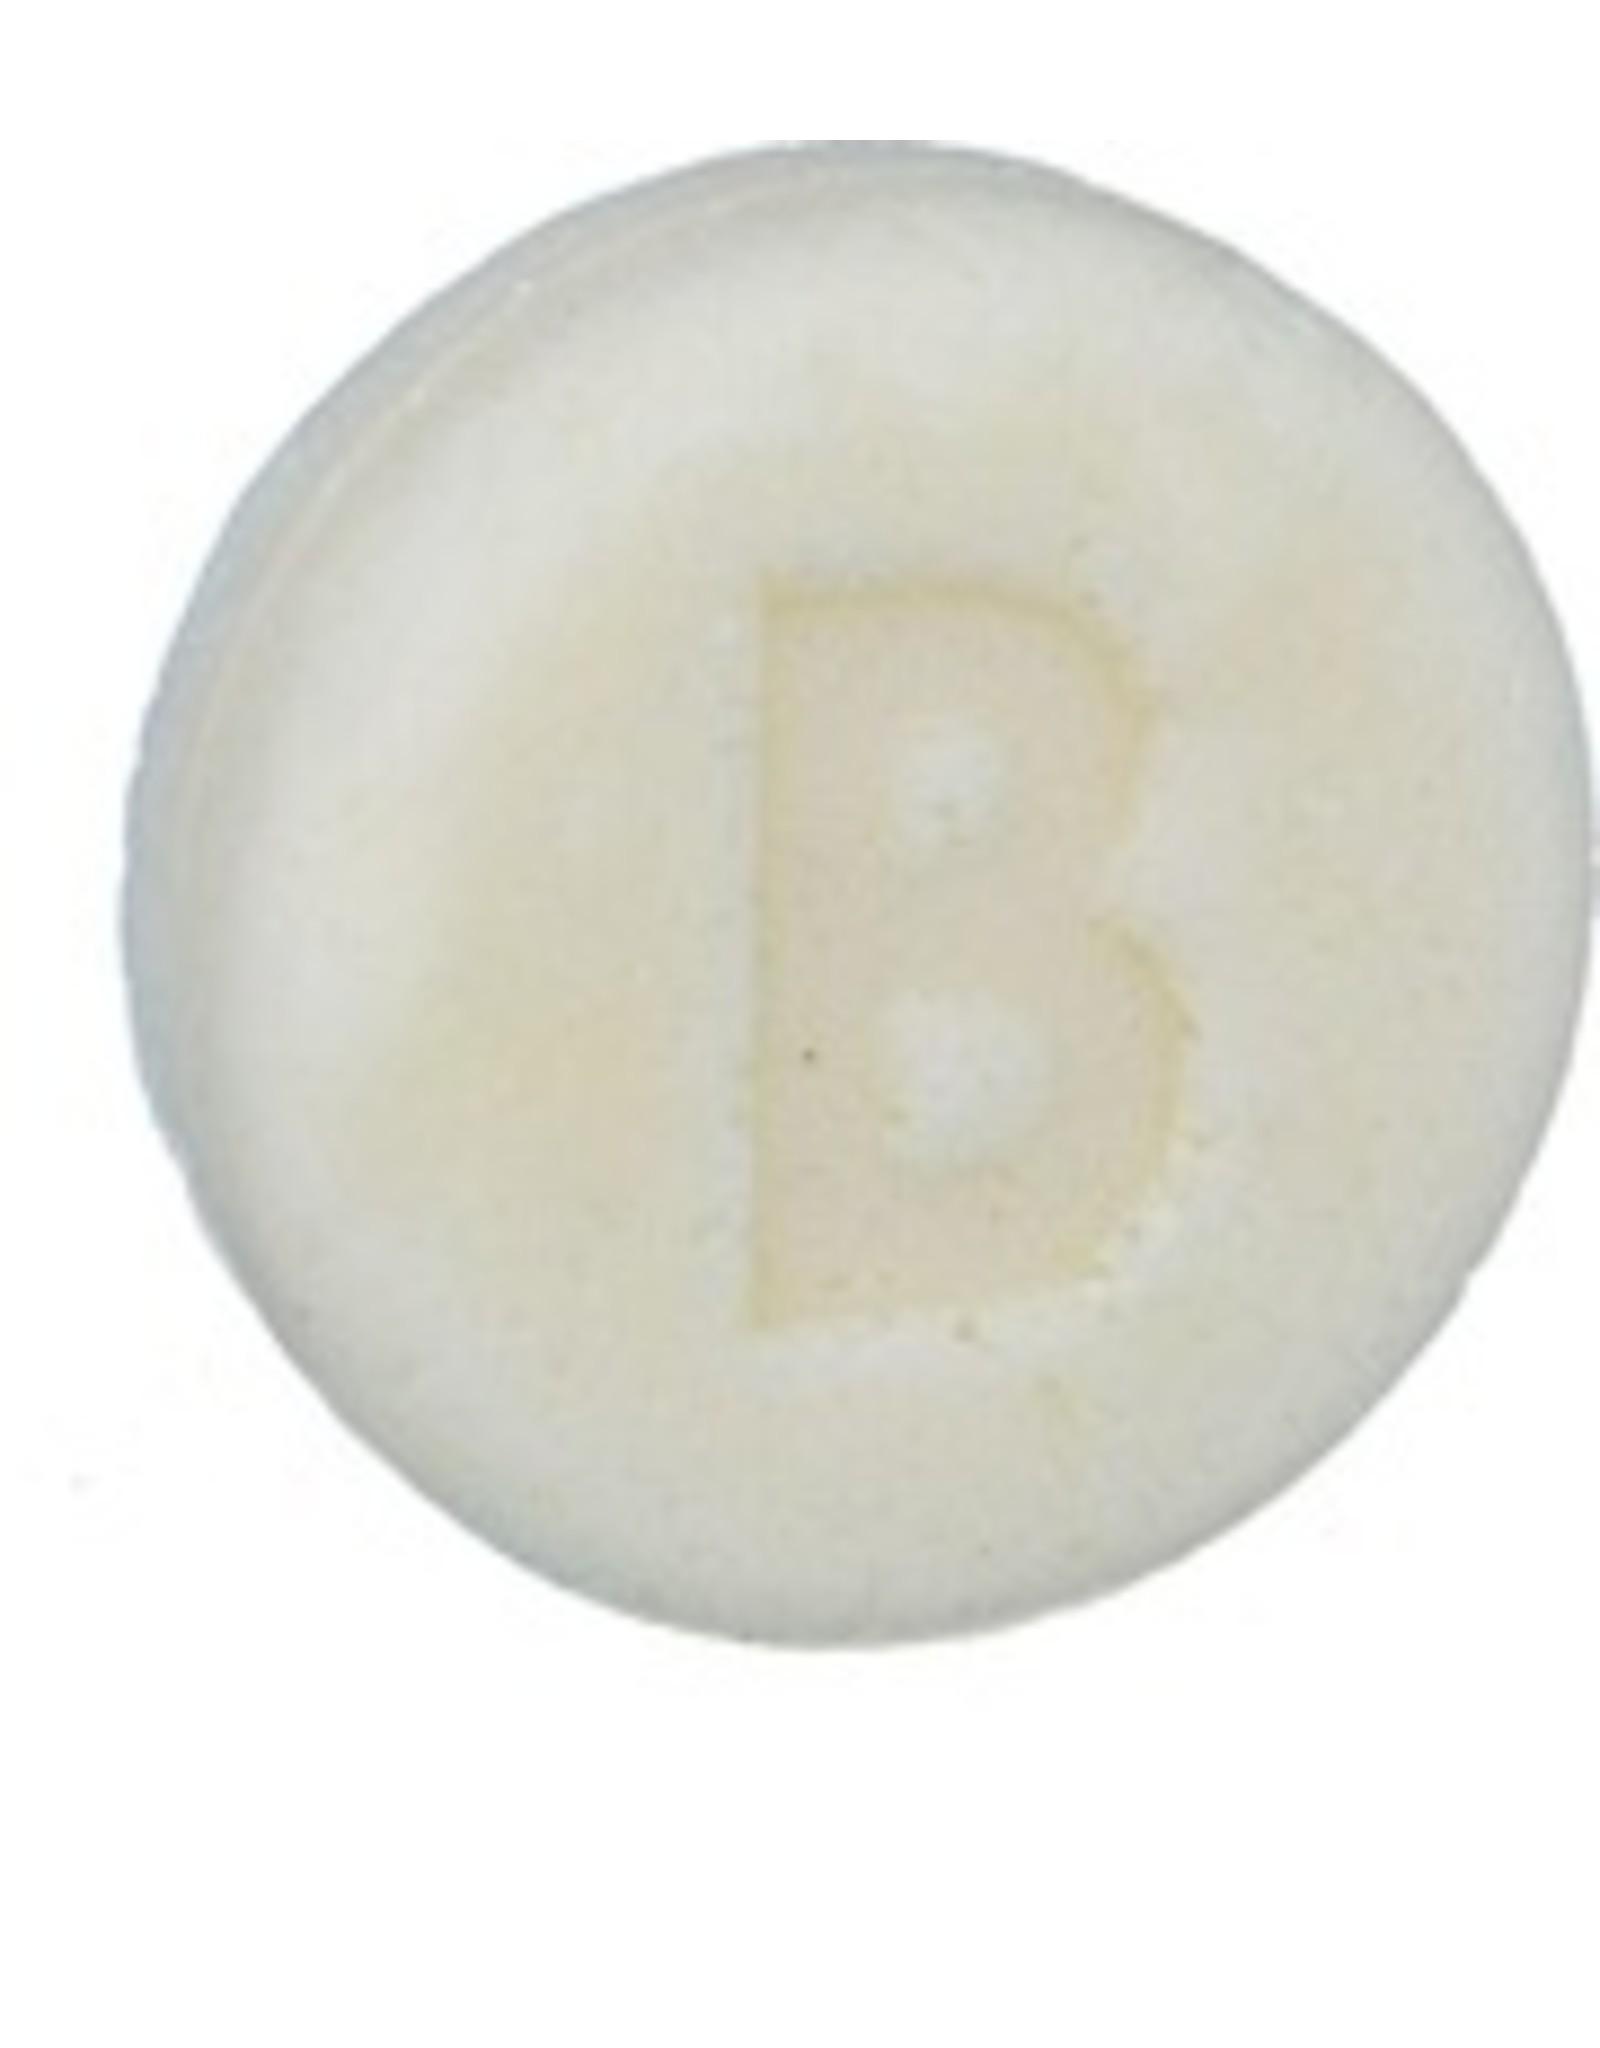 Bomb Cosmetics Conditioner Bar 'On Sleek' - Body & Soap